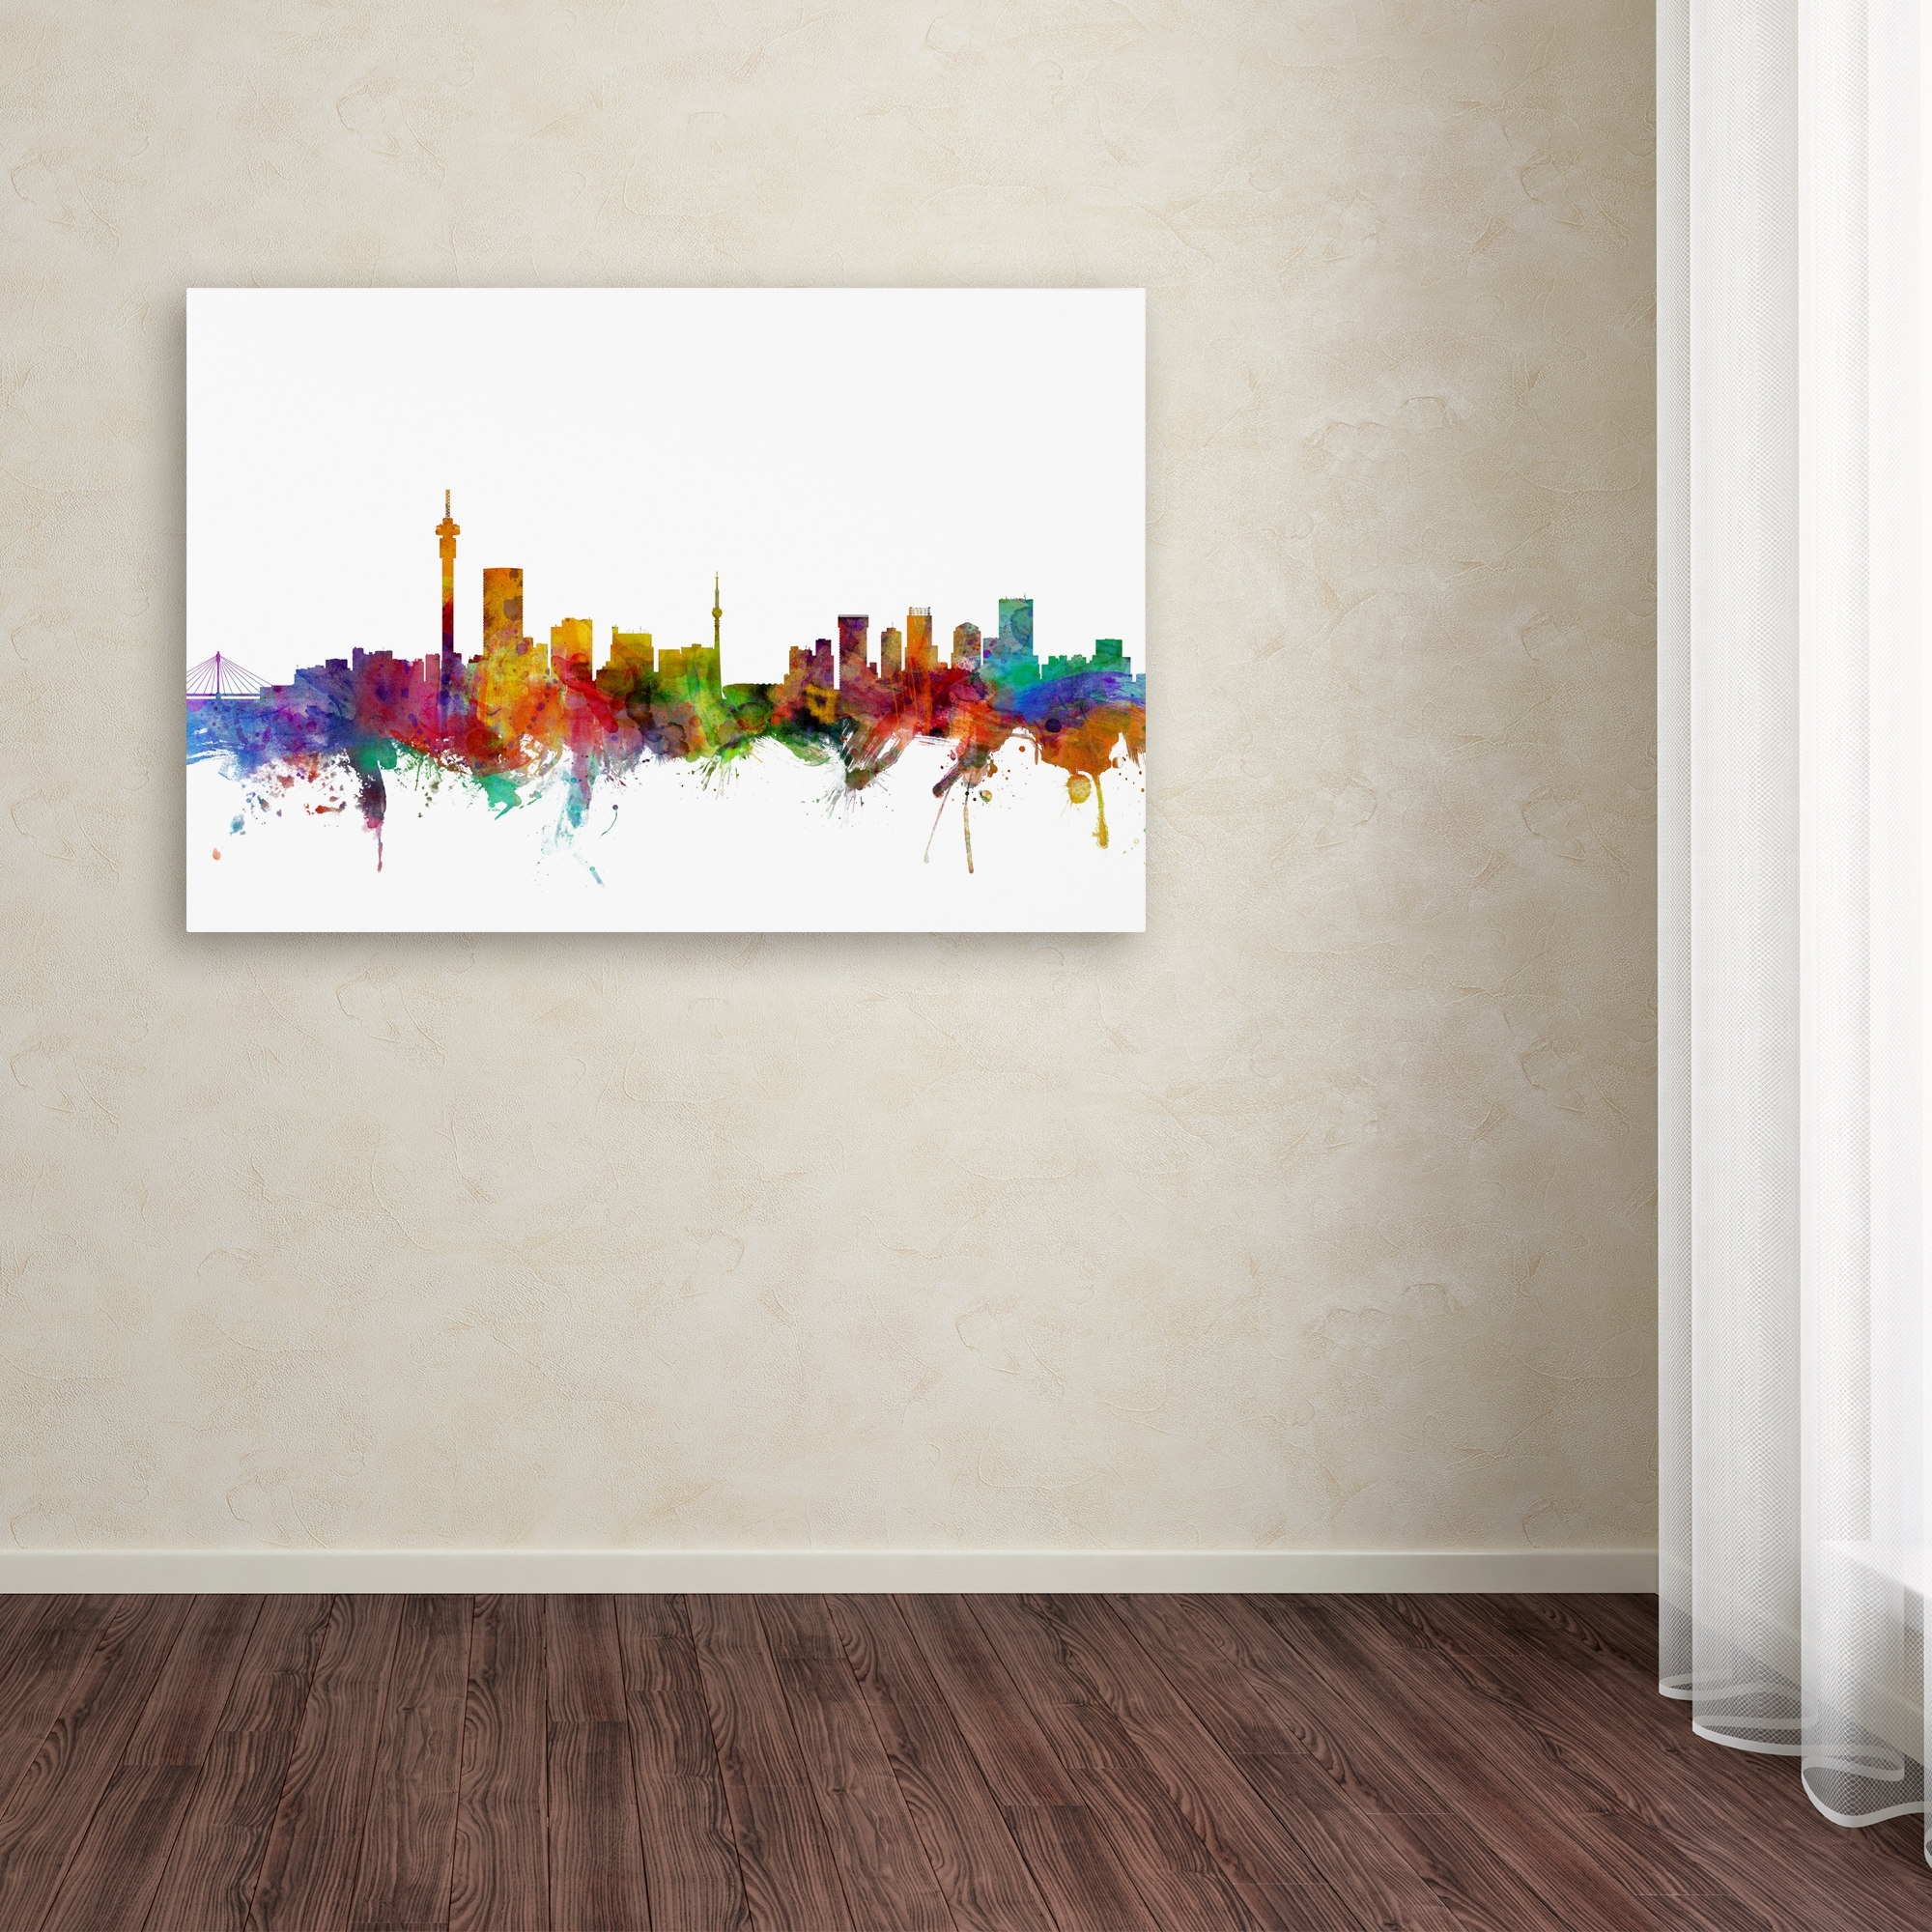 Michael Tompsett 'johannesburg South Africa Skyline' Canvas Wall Regarding Well Liked Johannesburg Canvas Wall Art (View 11 of 15)